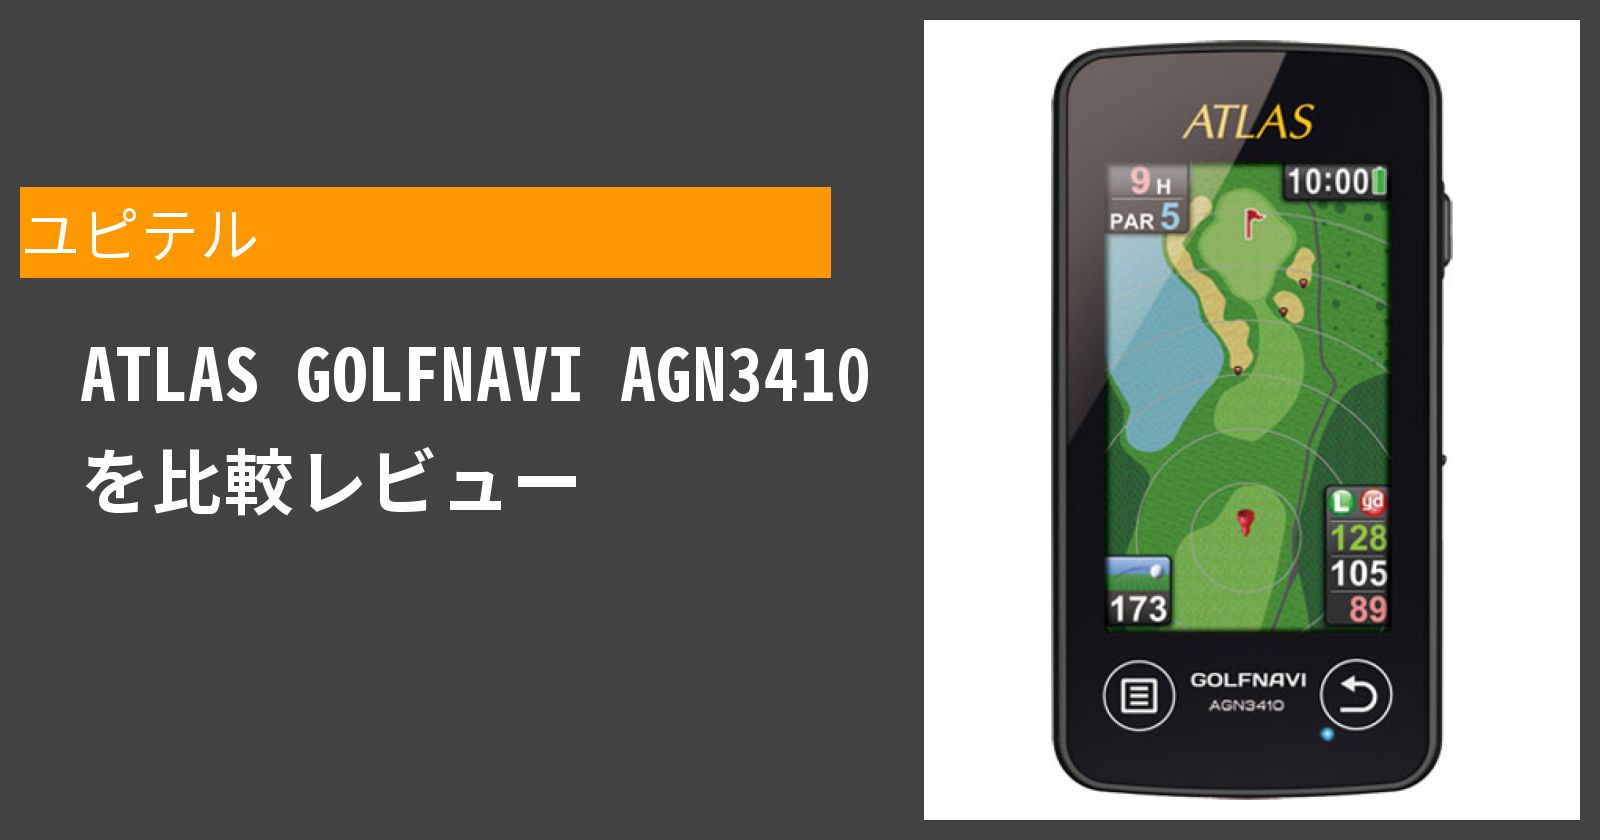 ATLAS GOLFNAVI AGN3410を徹底評価